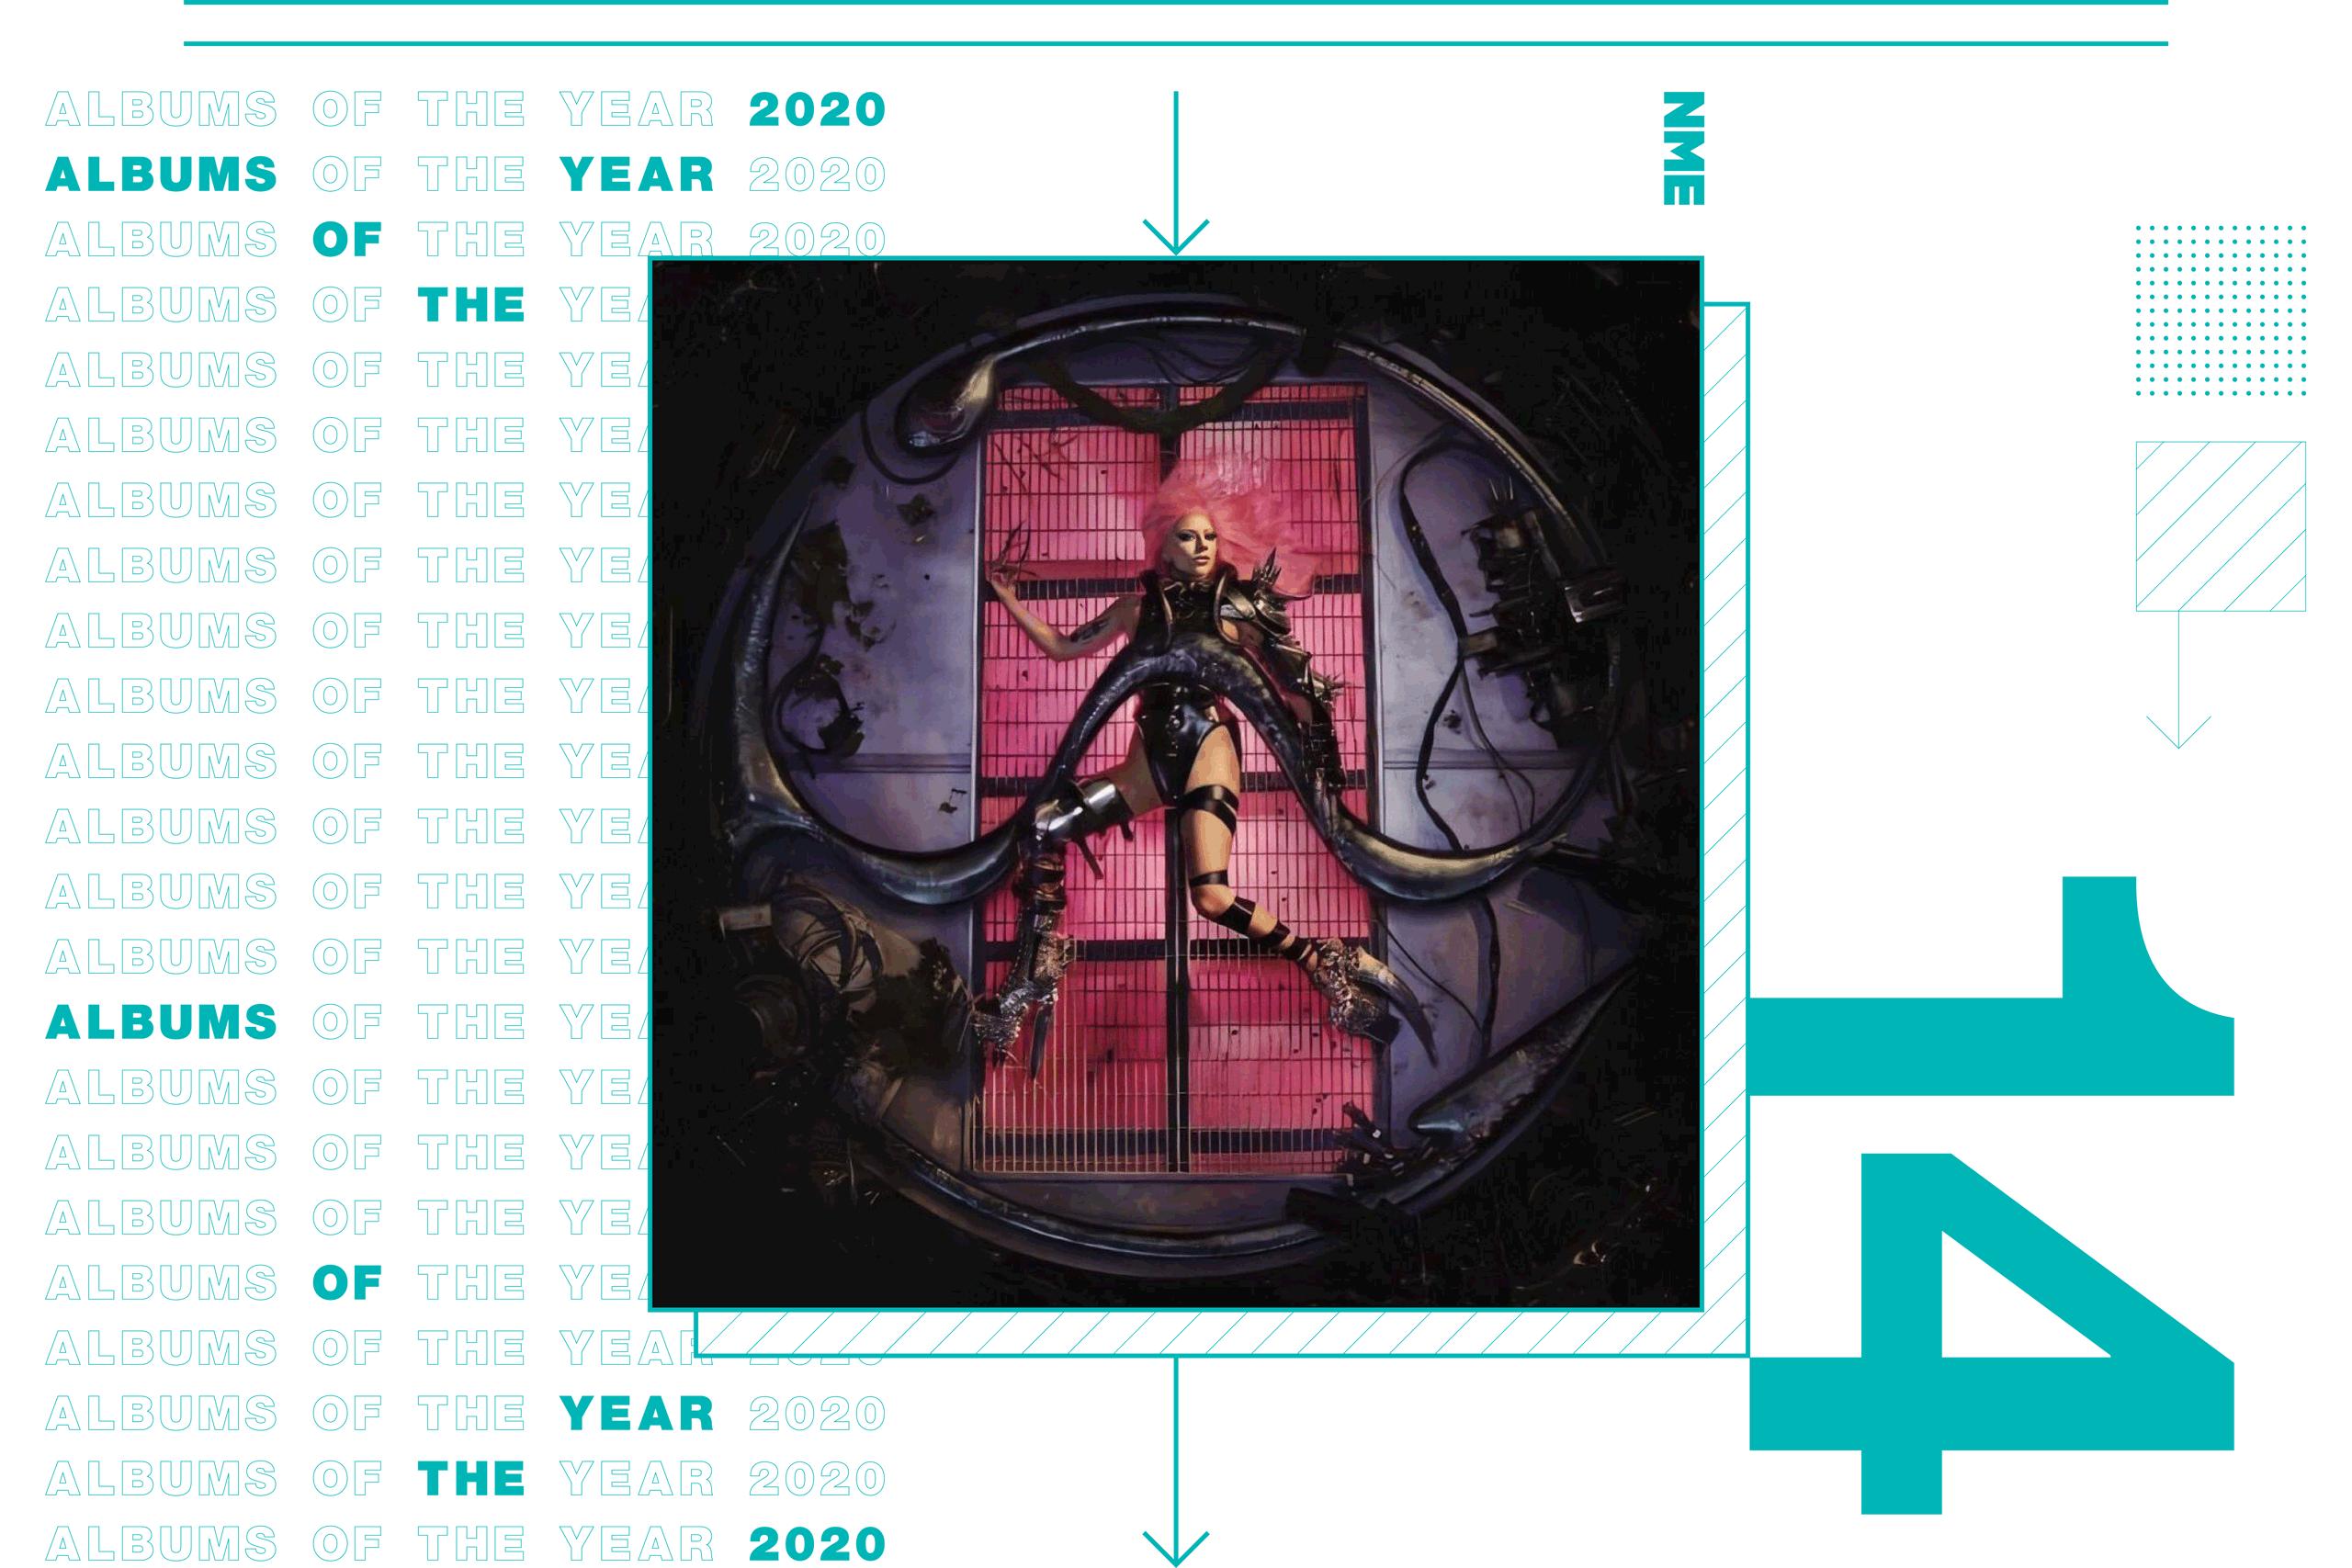 NME Album Of The Year 2020 Lady Gaga, 'Chromatica'